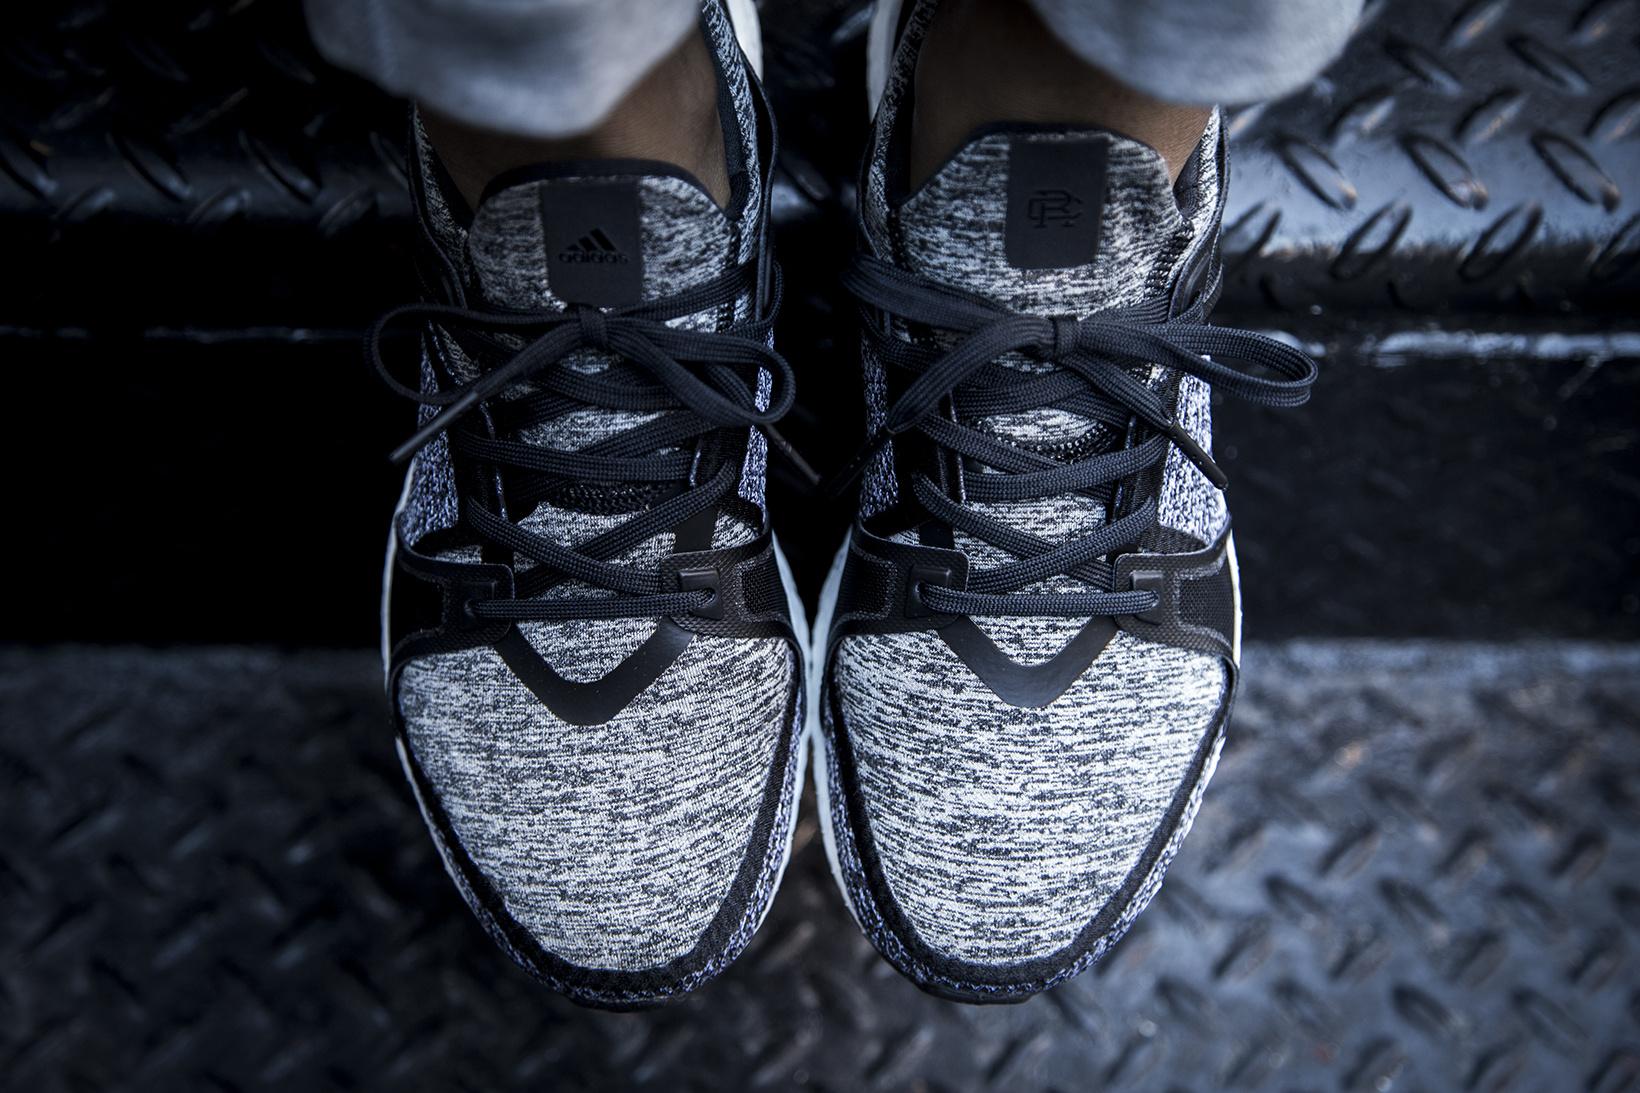 reigning-champ-adidas-pureboost-closer-look-2.jpg